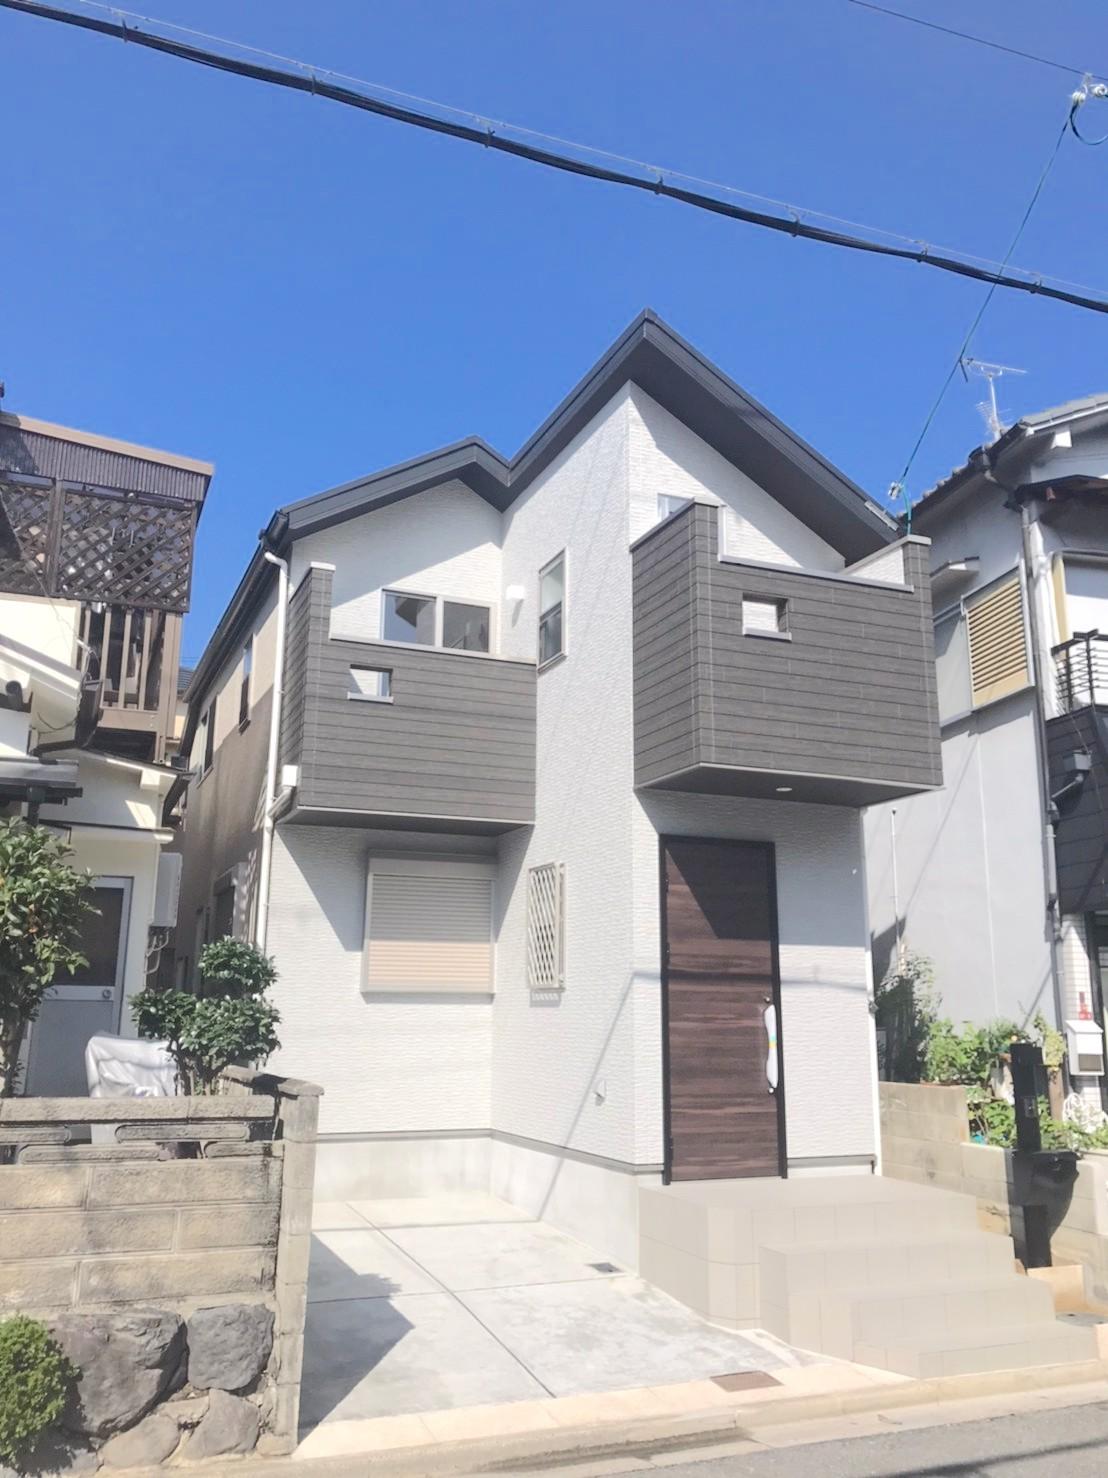 nagisaminami-town-new-construction